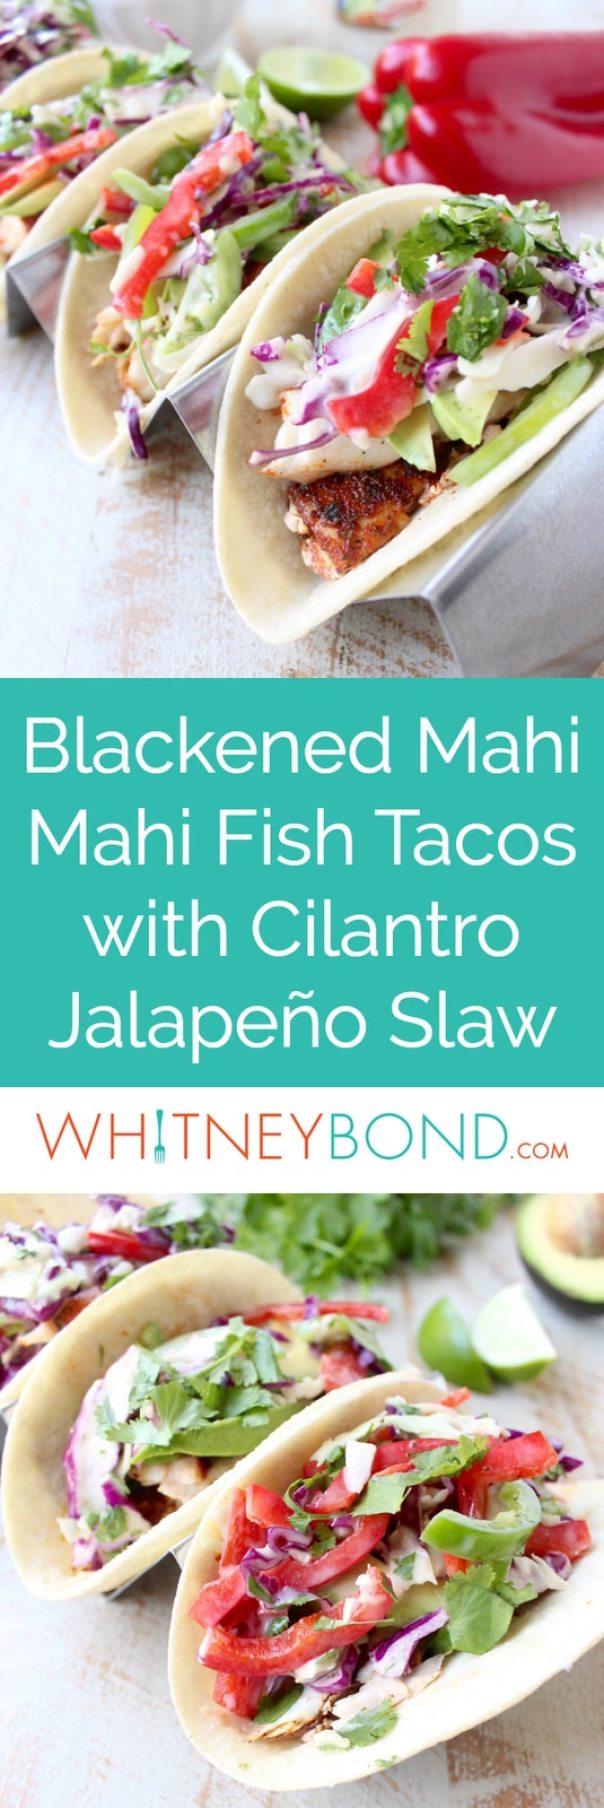 Blackened mahi mahi is pan seared & served in warm tortillas topped with crisp, fresh cilantro jalapeno coleslaw in this Mahi Mahi Fish Tacos recipe!